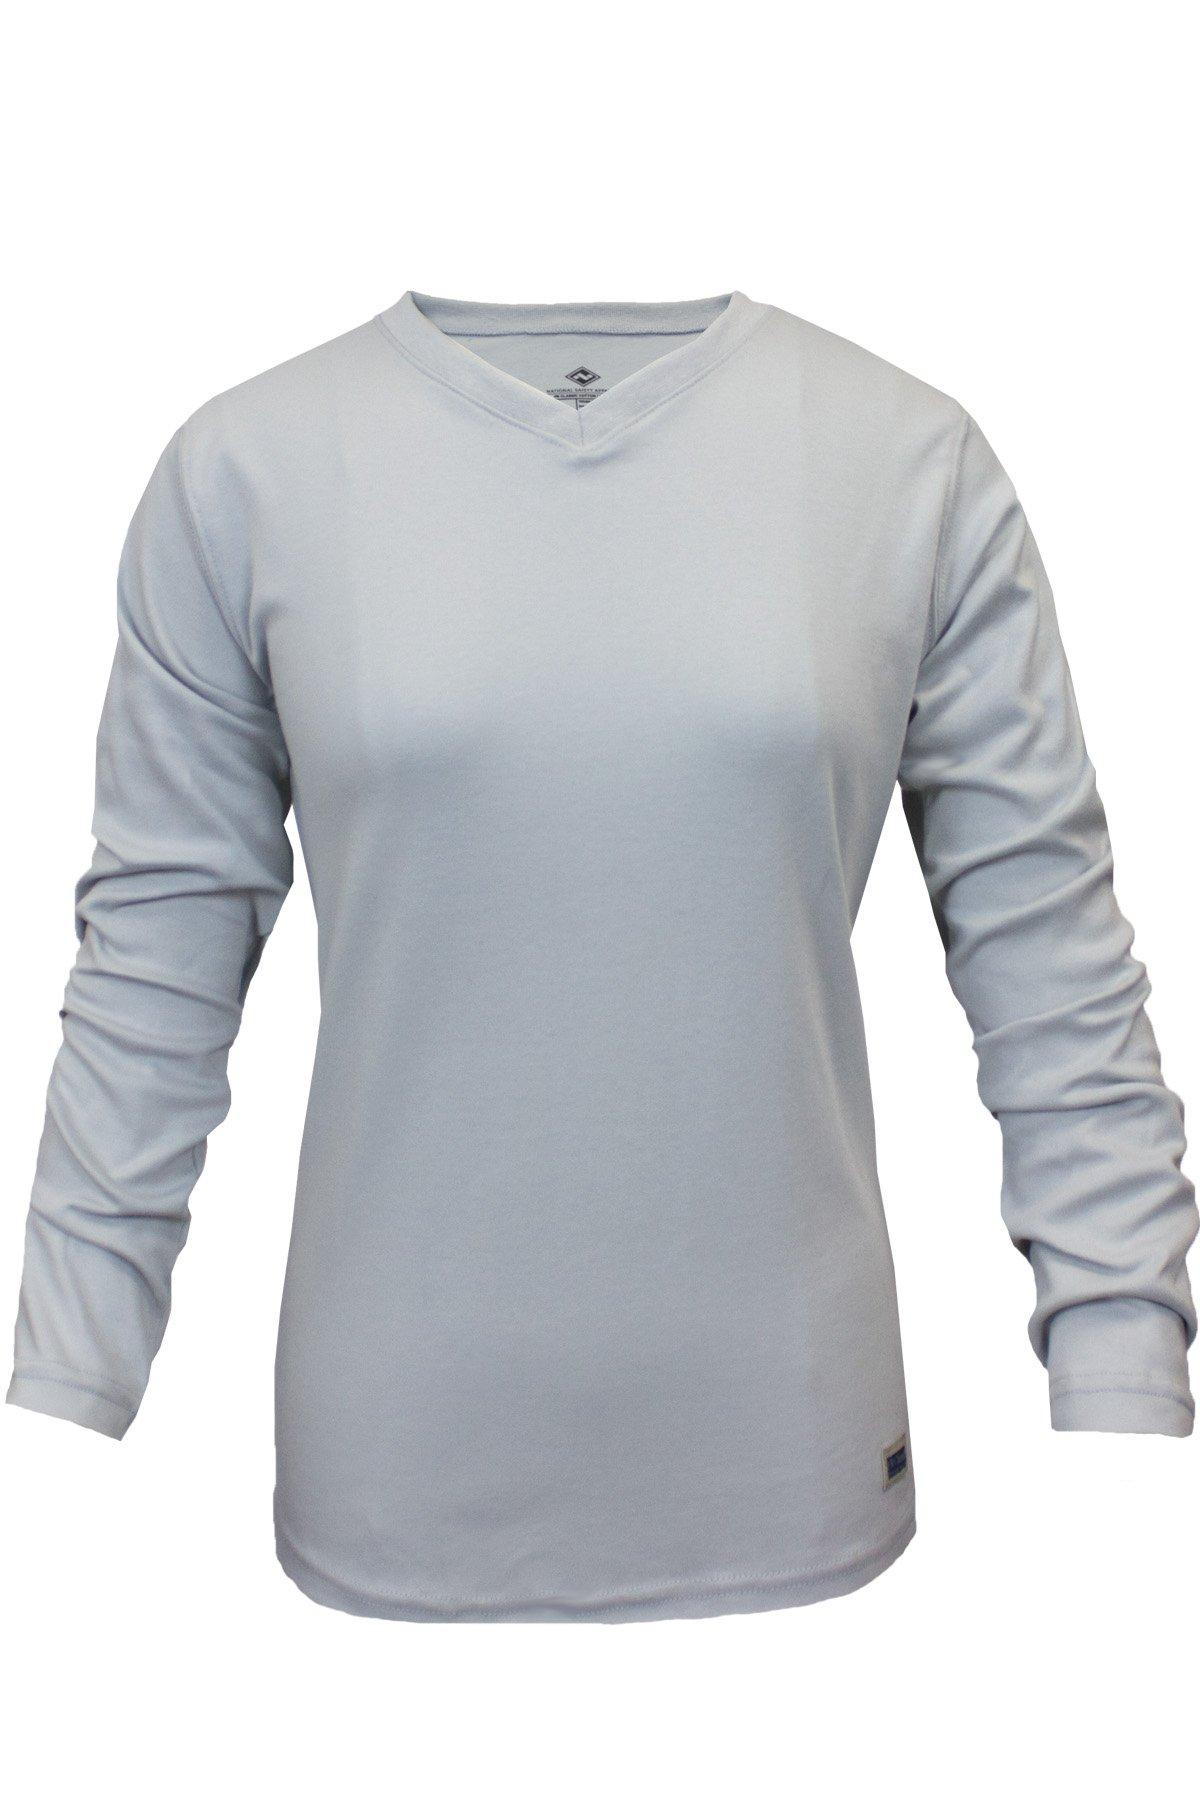 National Safety Apparel C54PGLSWLG Women's FR Classic Cotton Long Sleeve T-Shirt, 100% FR Cotton, Large, Gray